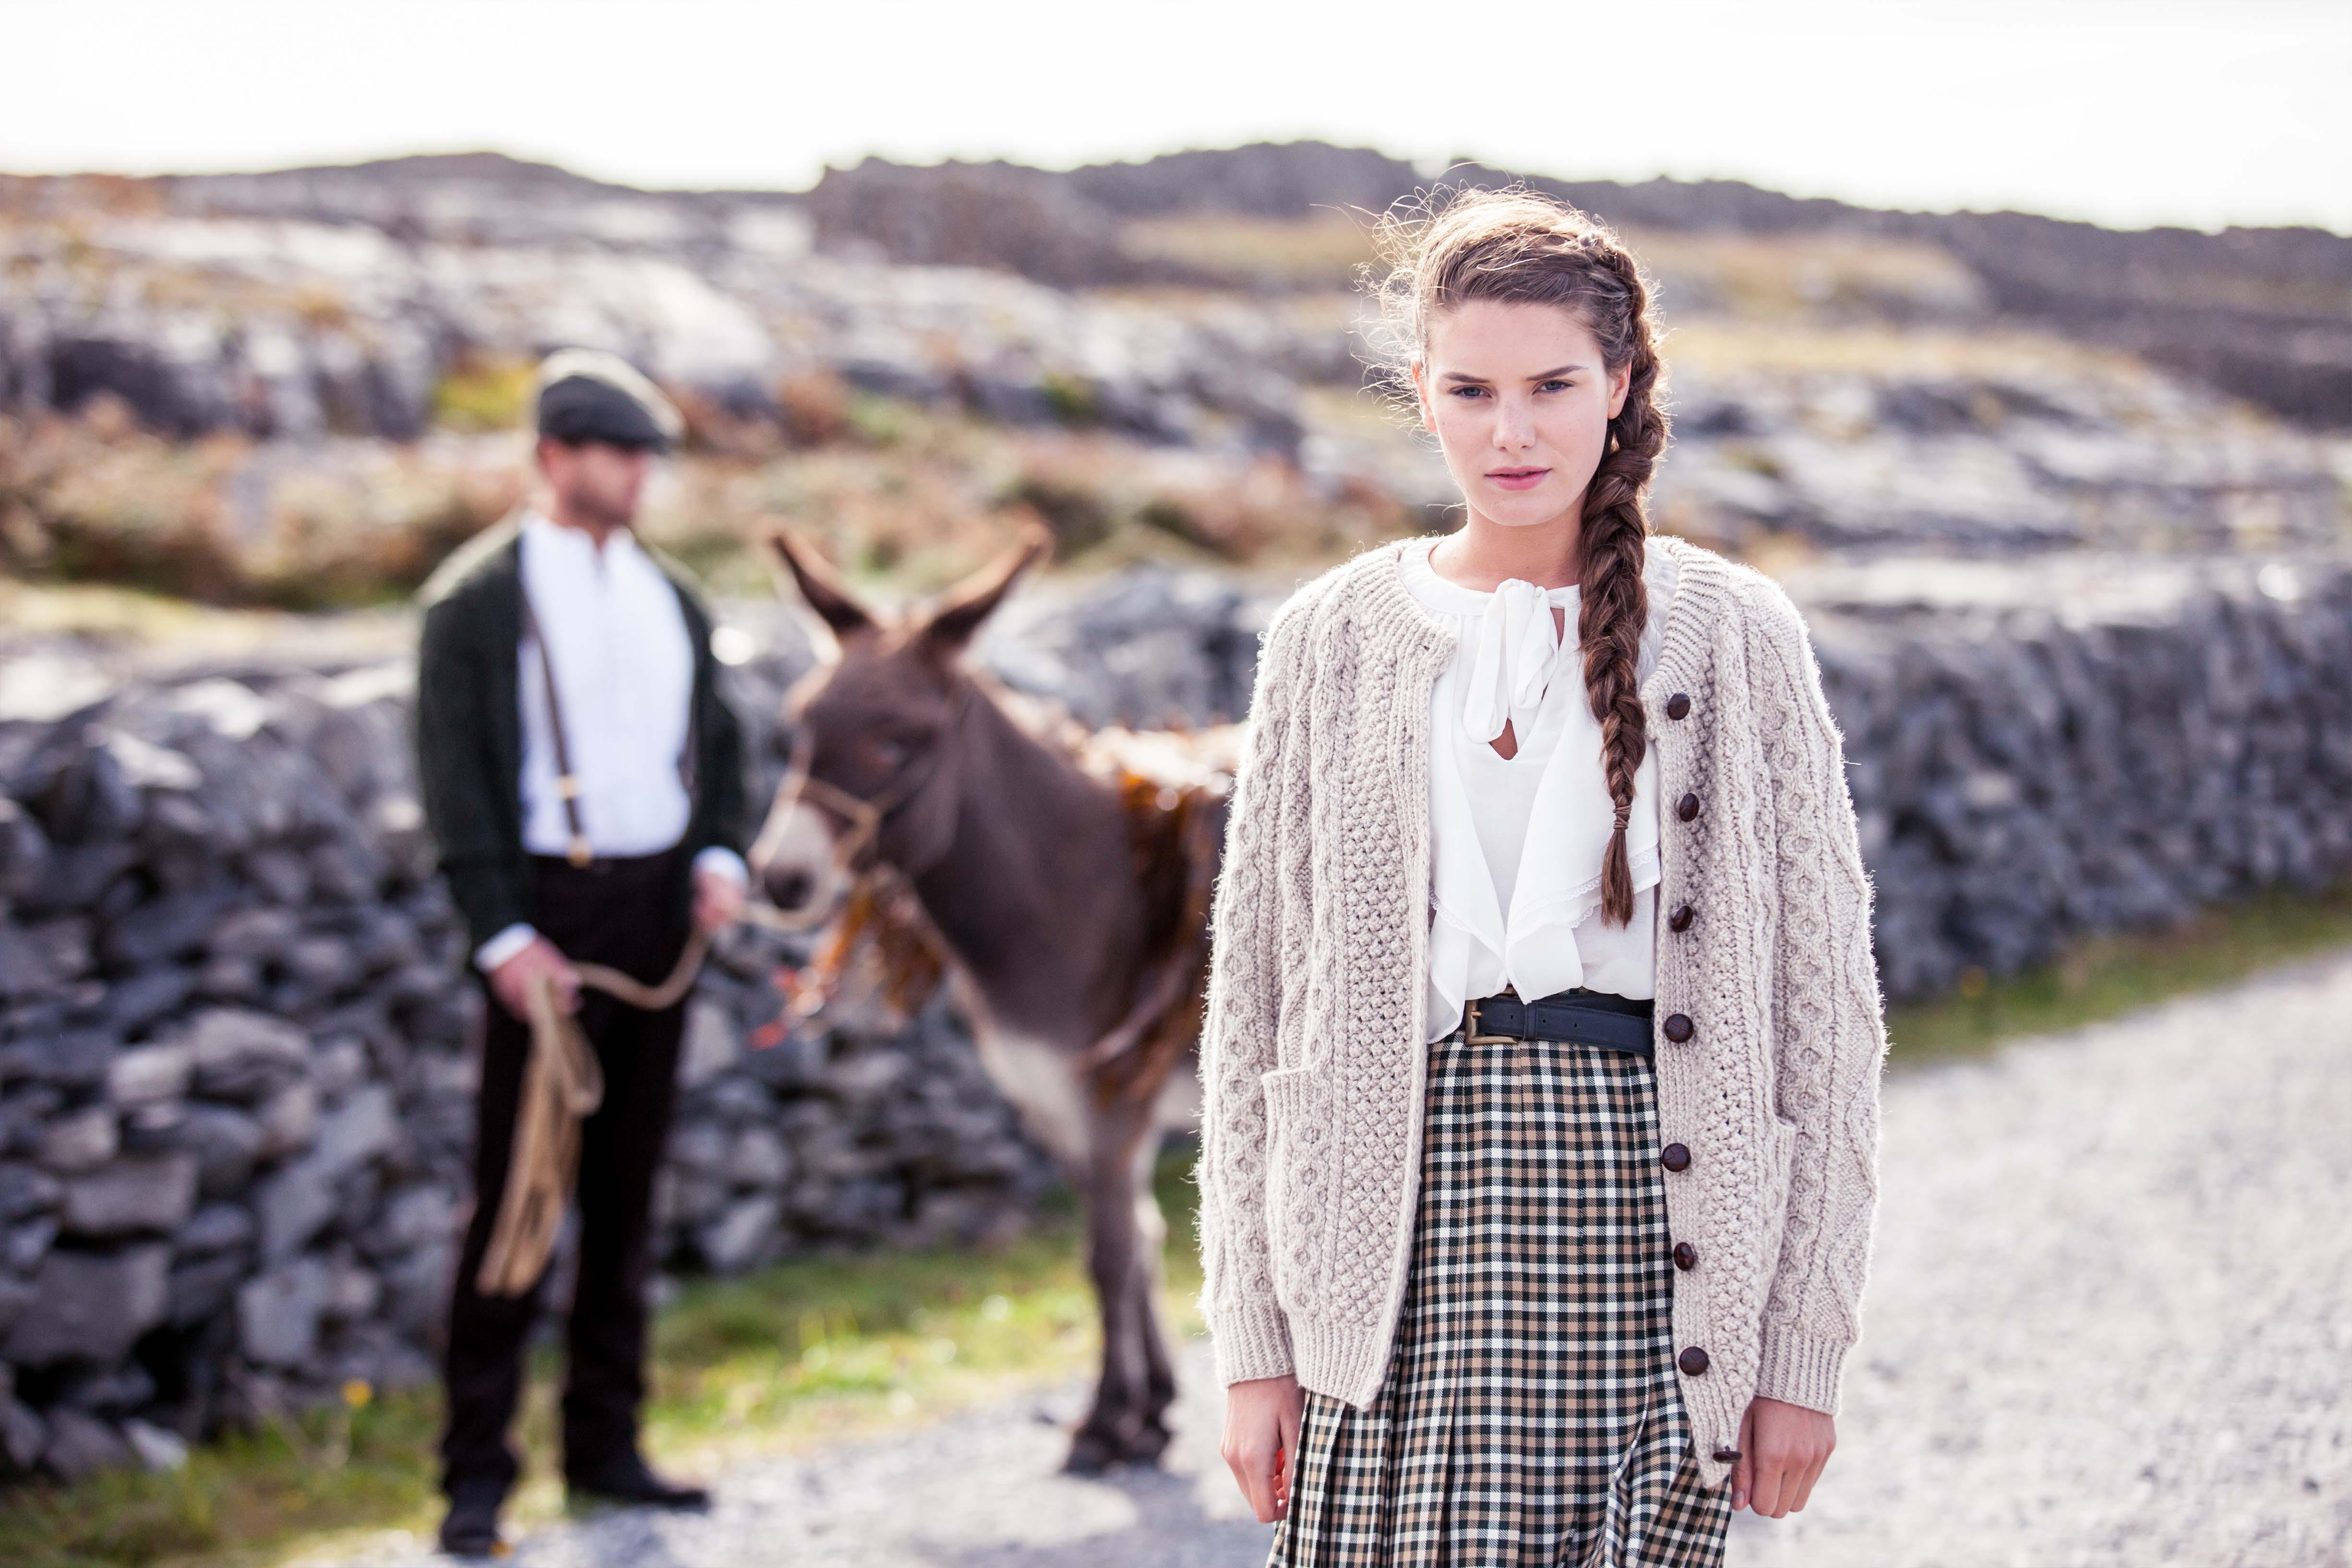 About Aran Sweater Market, Ireland